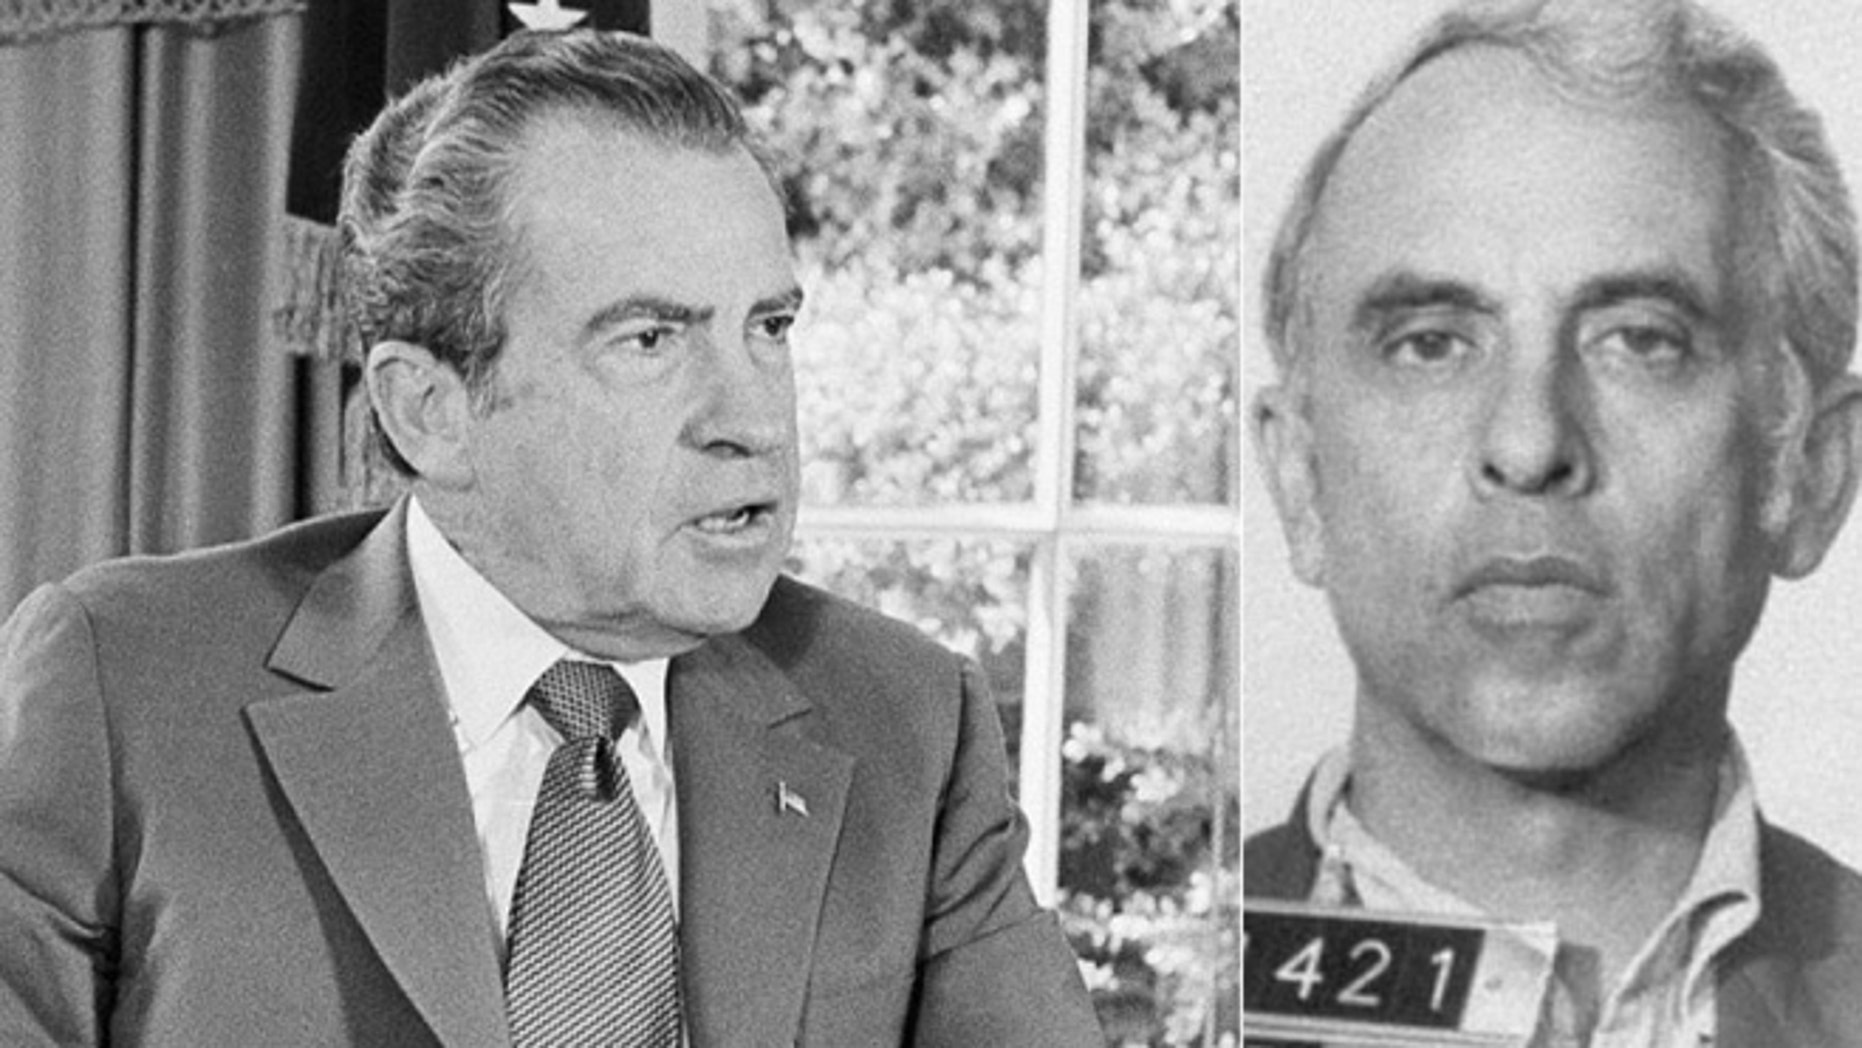 President Richard Nixon, left, and Watergate burglar and CIA agent, Eugenio Martinez. (Photos: Associated Press)